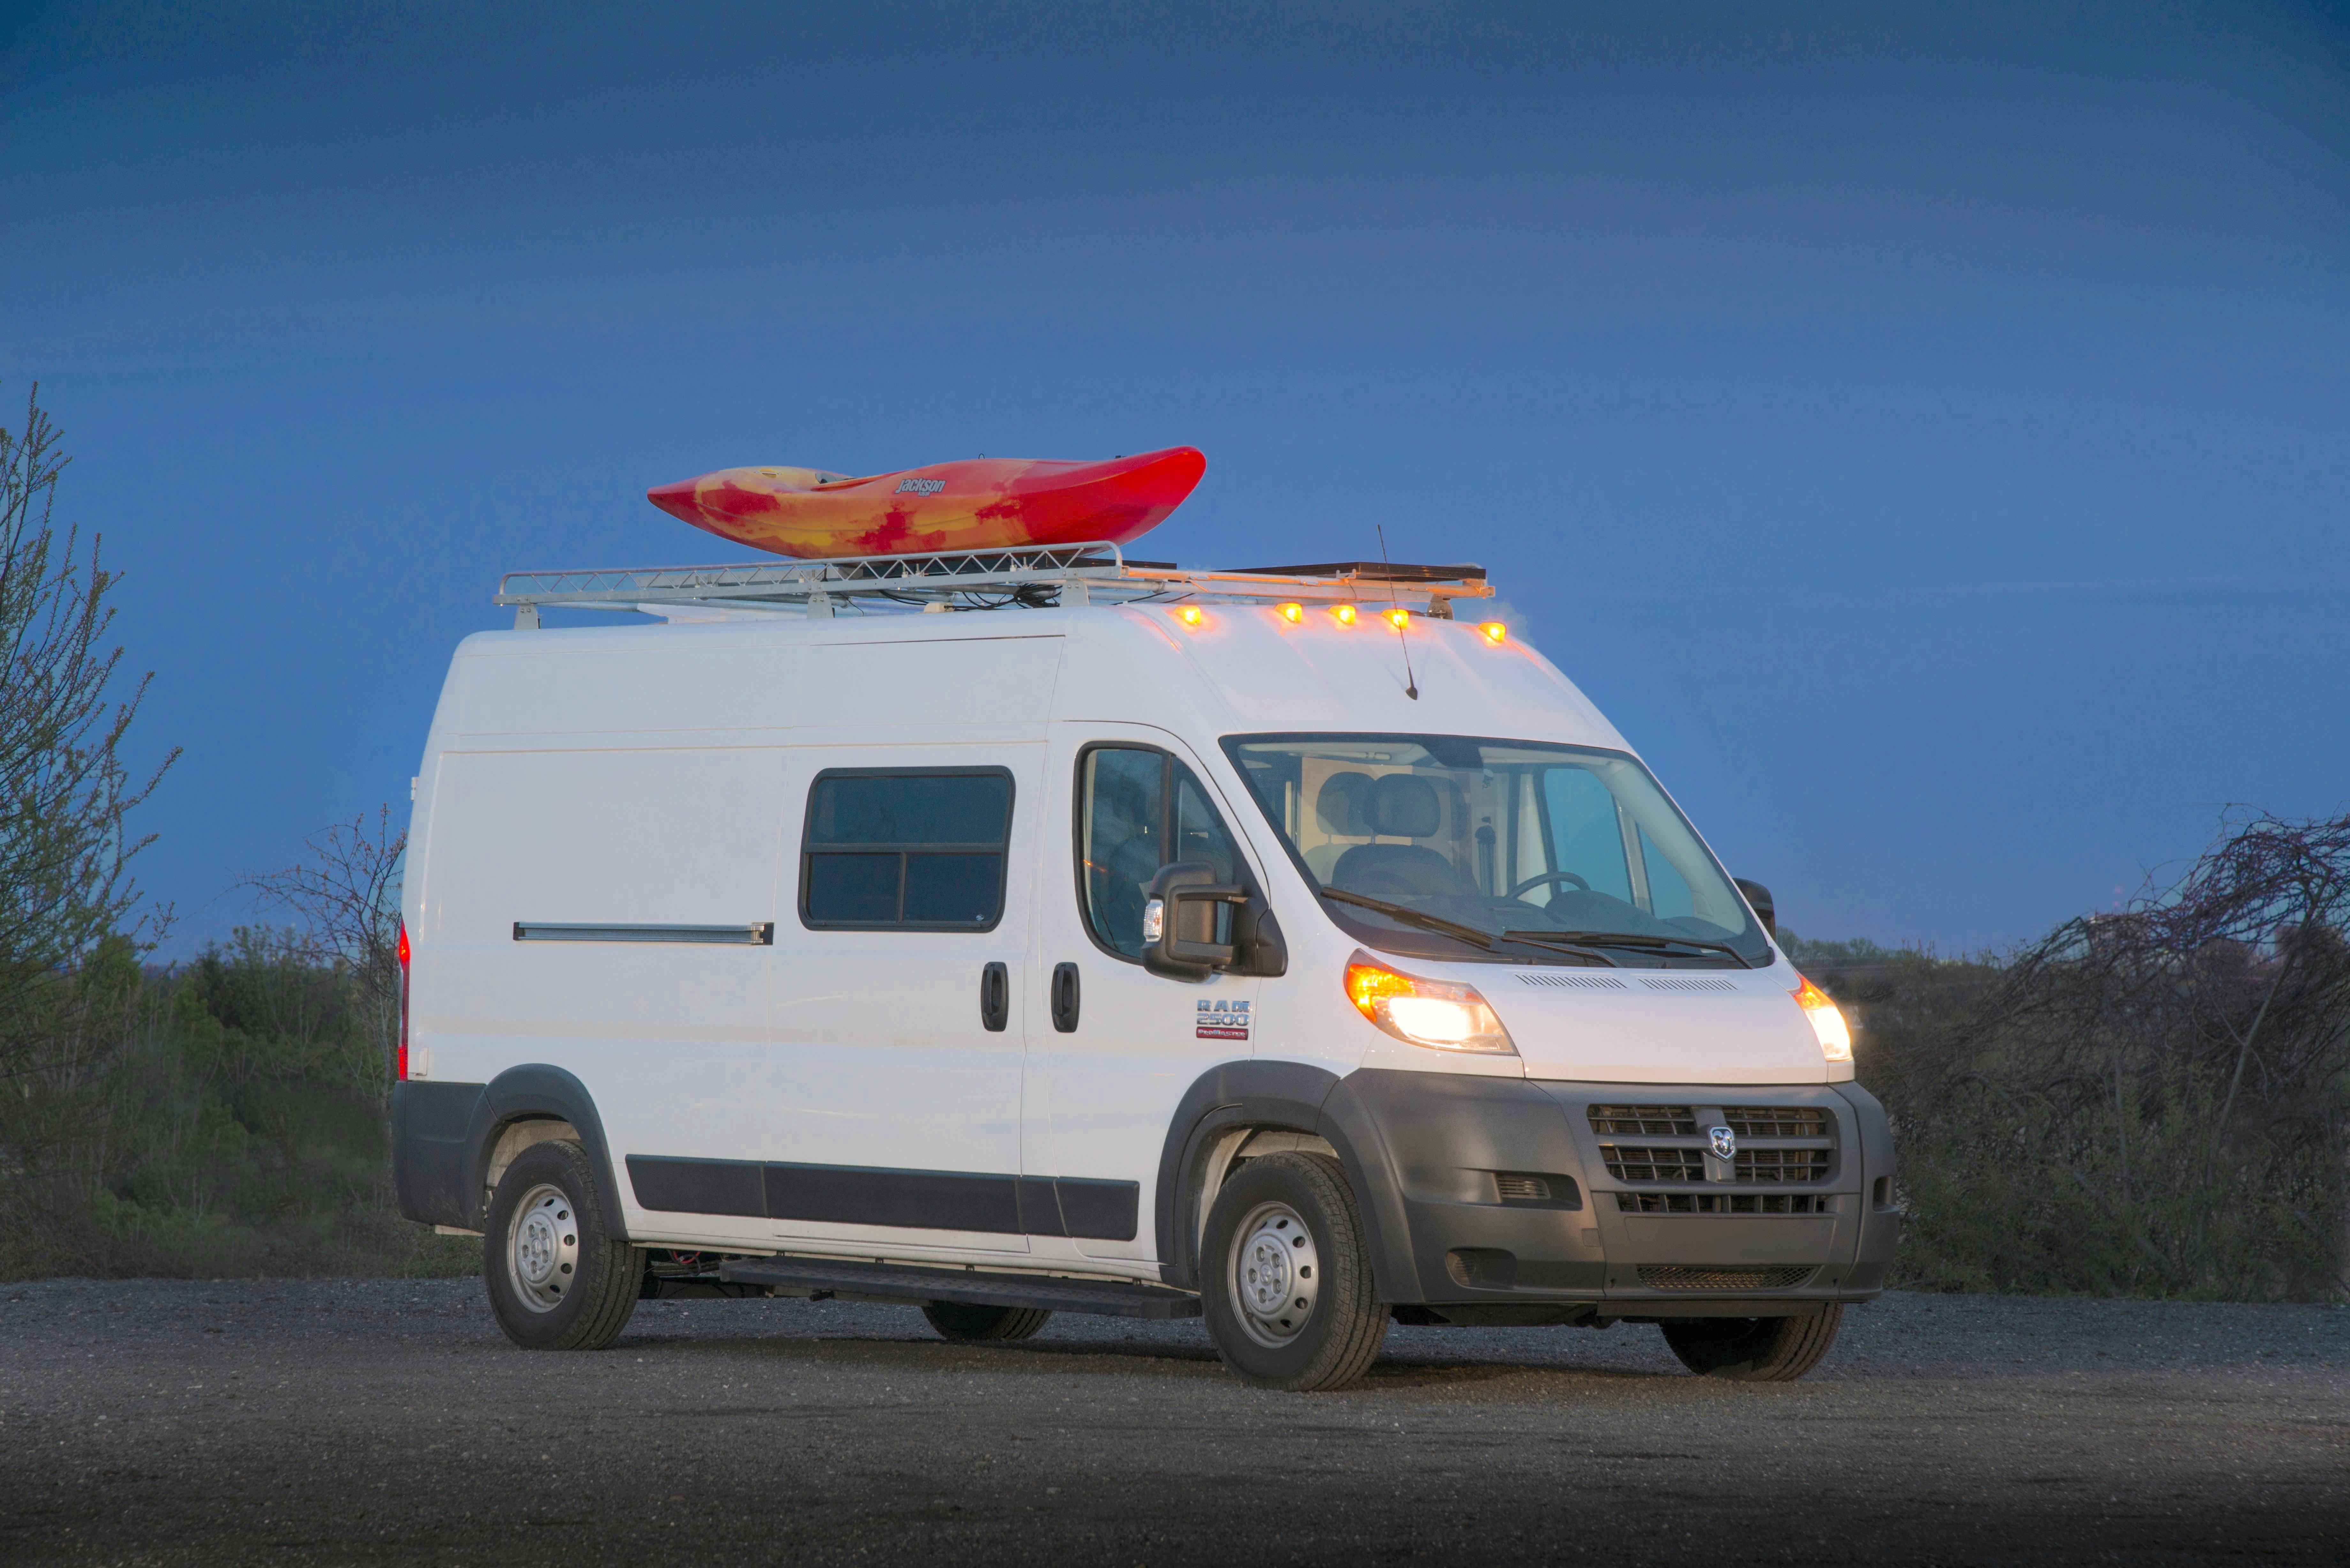 Budget-conscious camper gets you van life for $60K